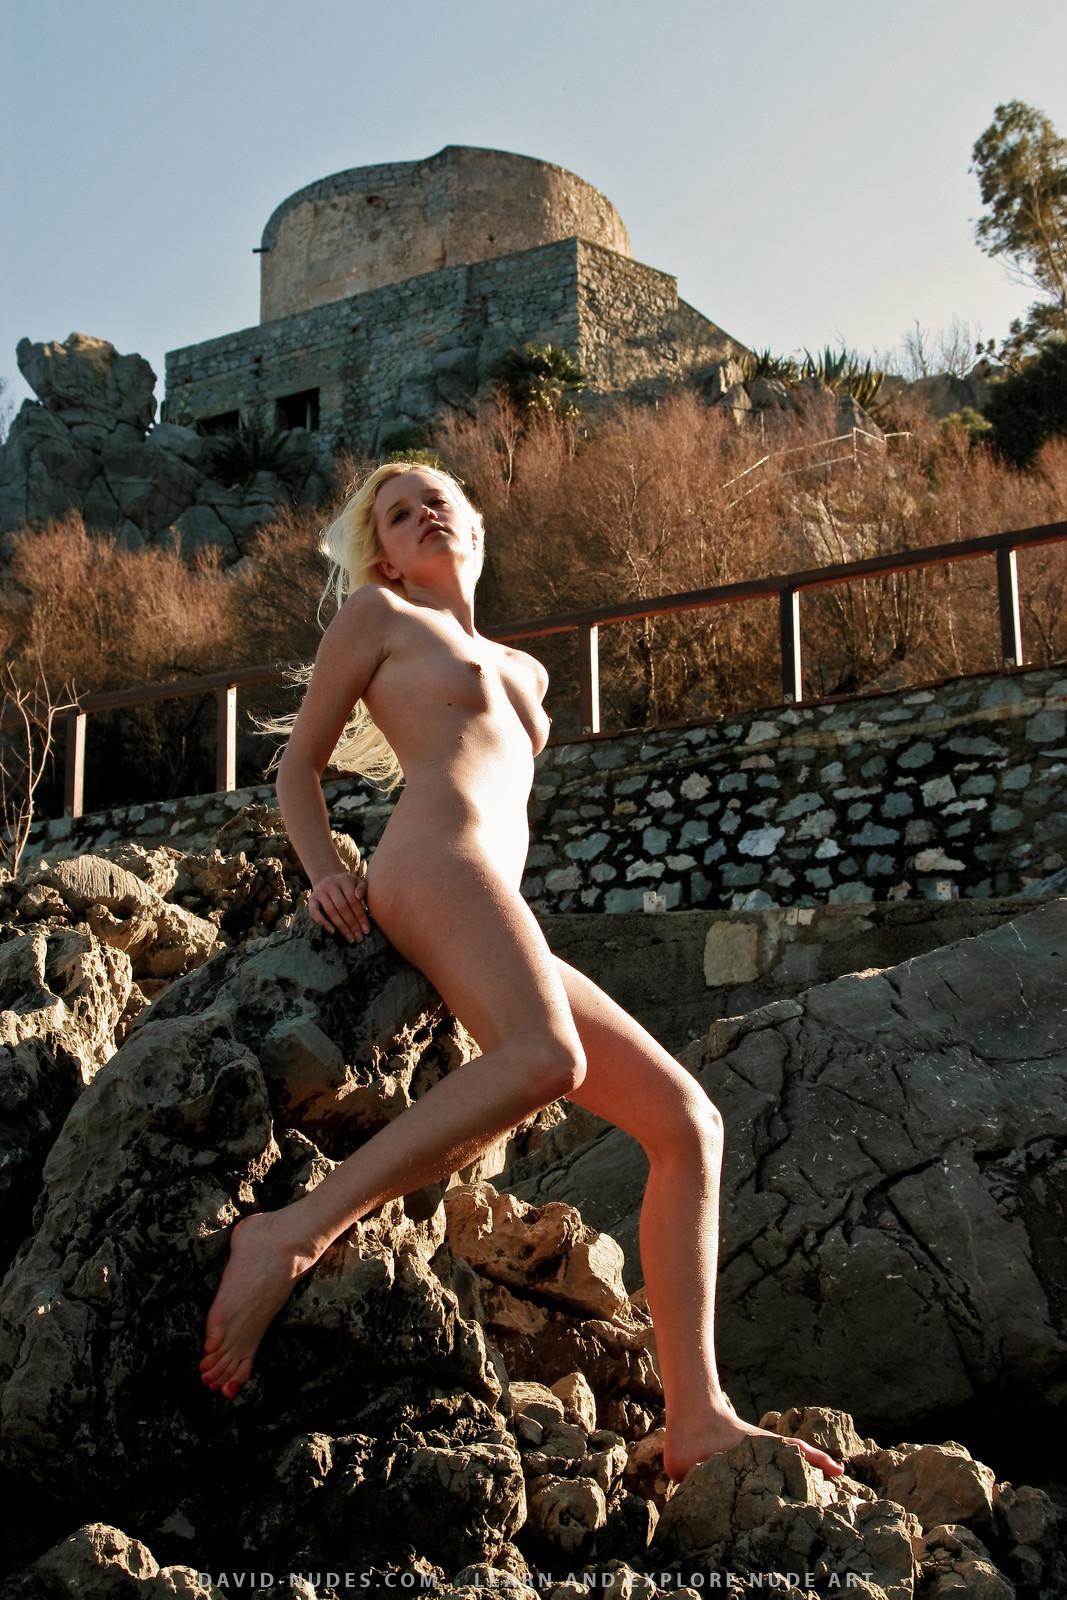 Geile Frau. Nude girls tour castle